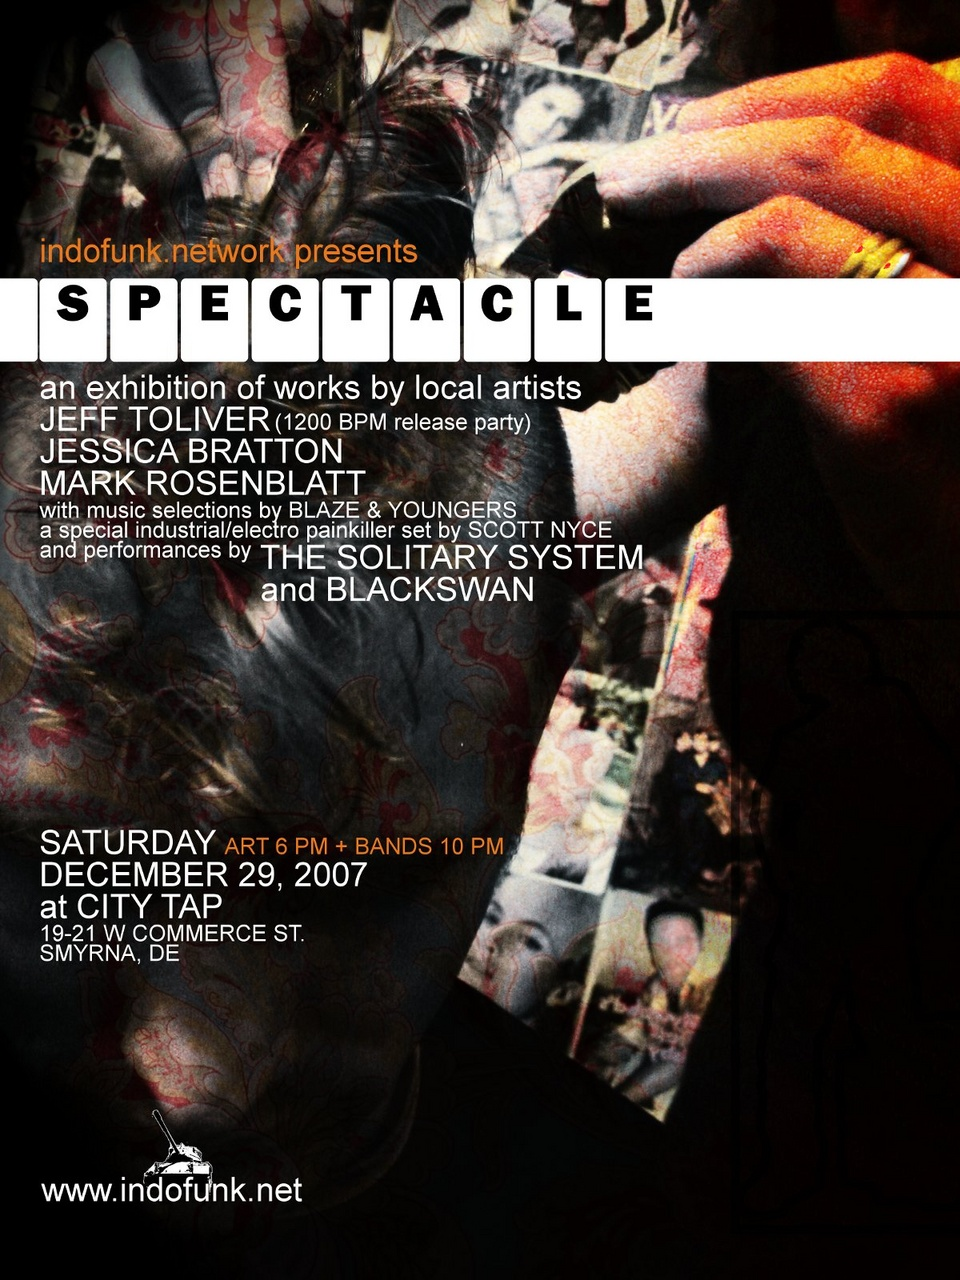 Spectacle 2007-12-no-bpm.jpg